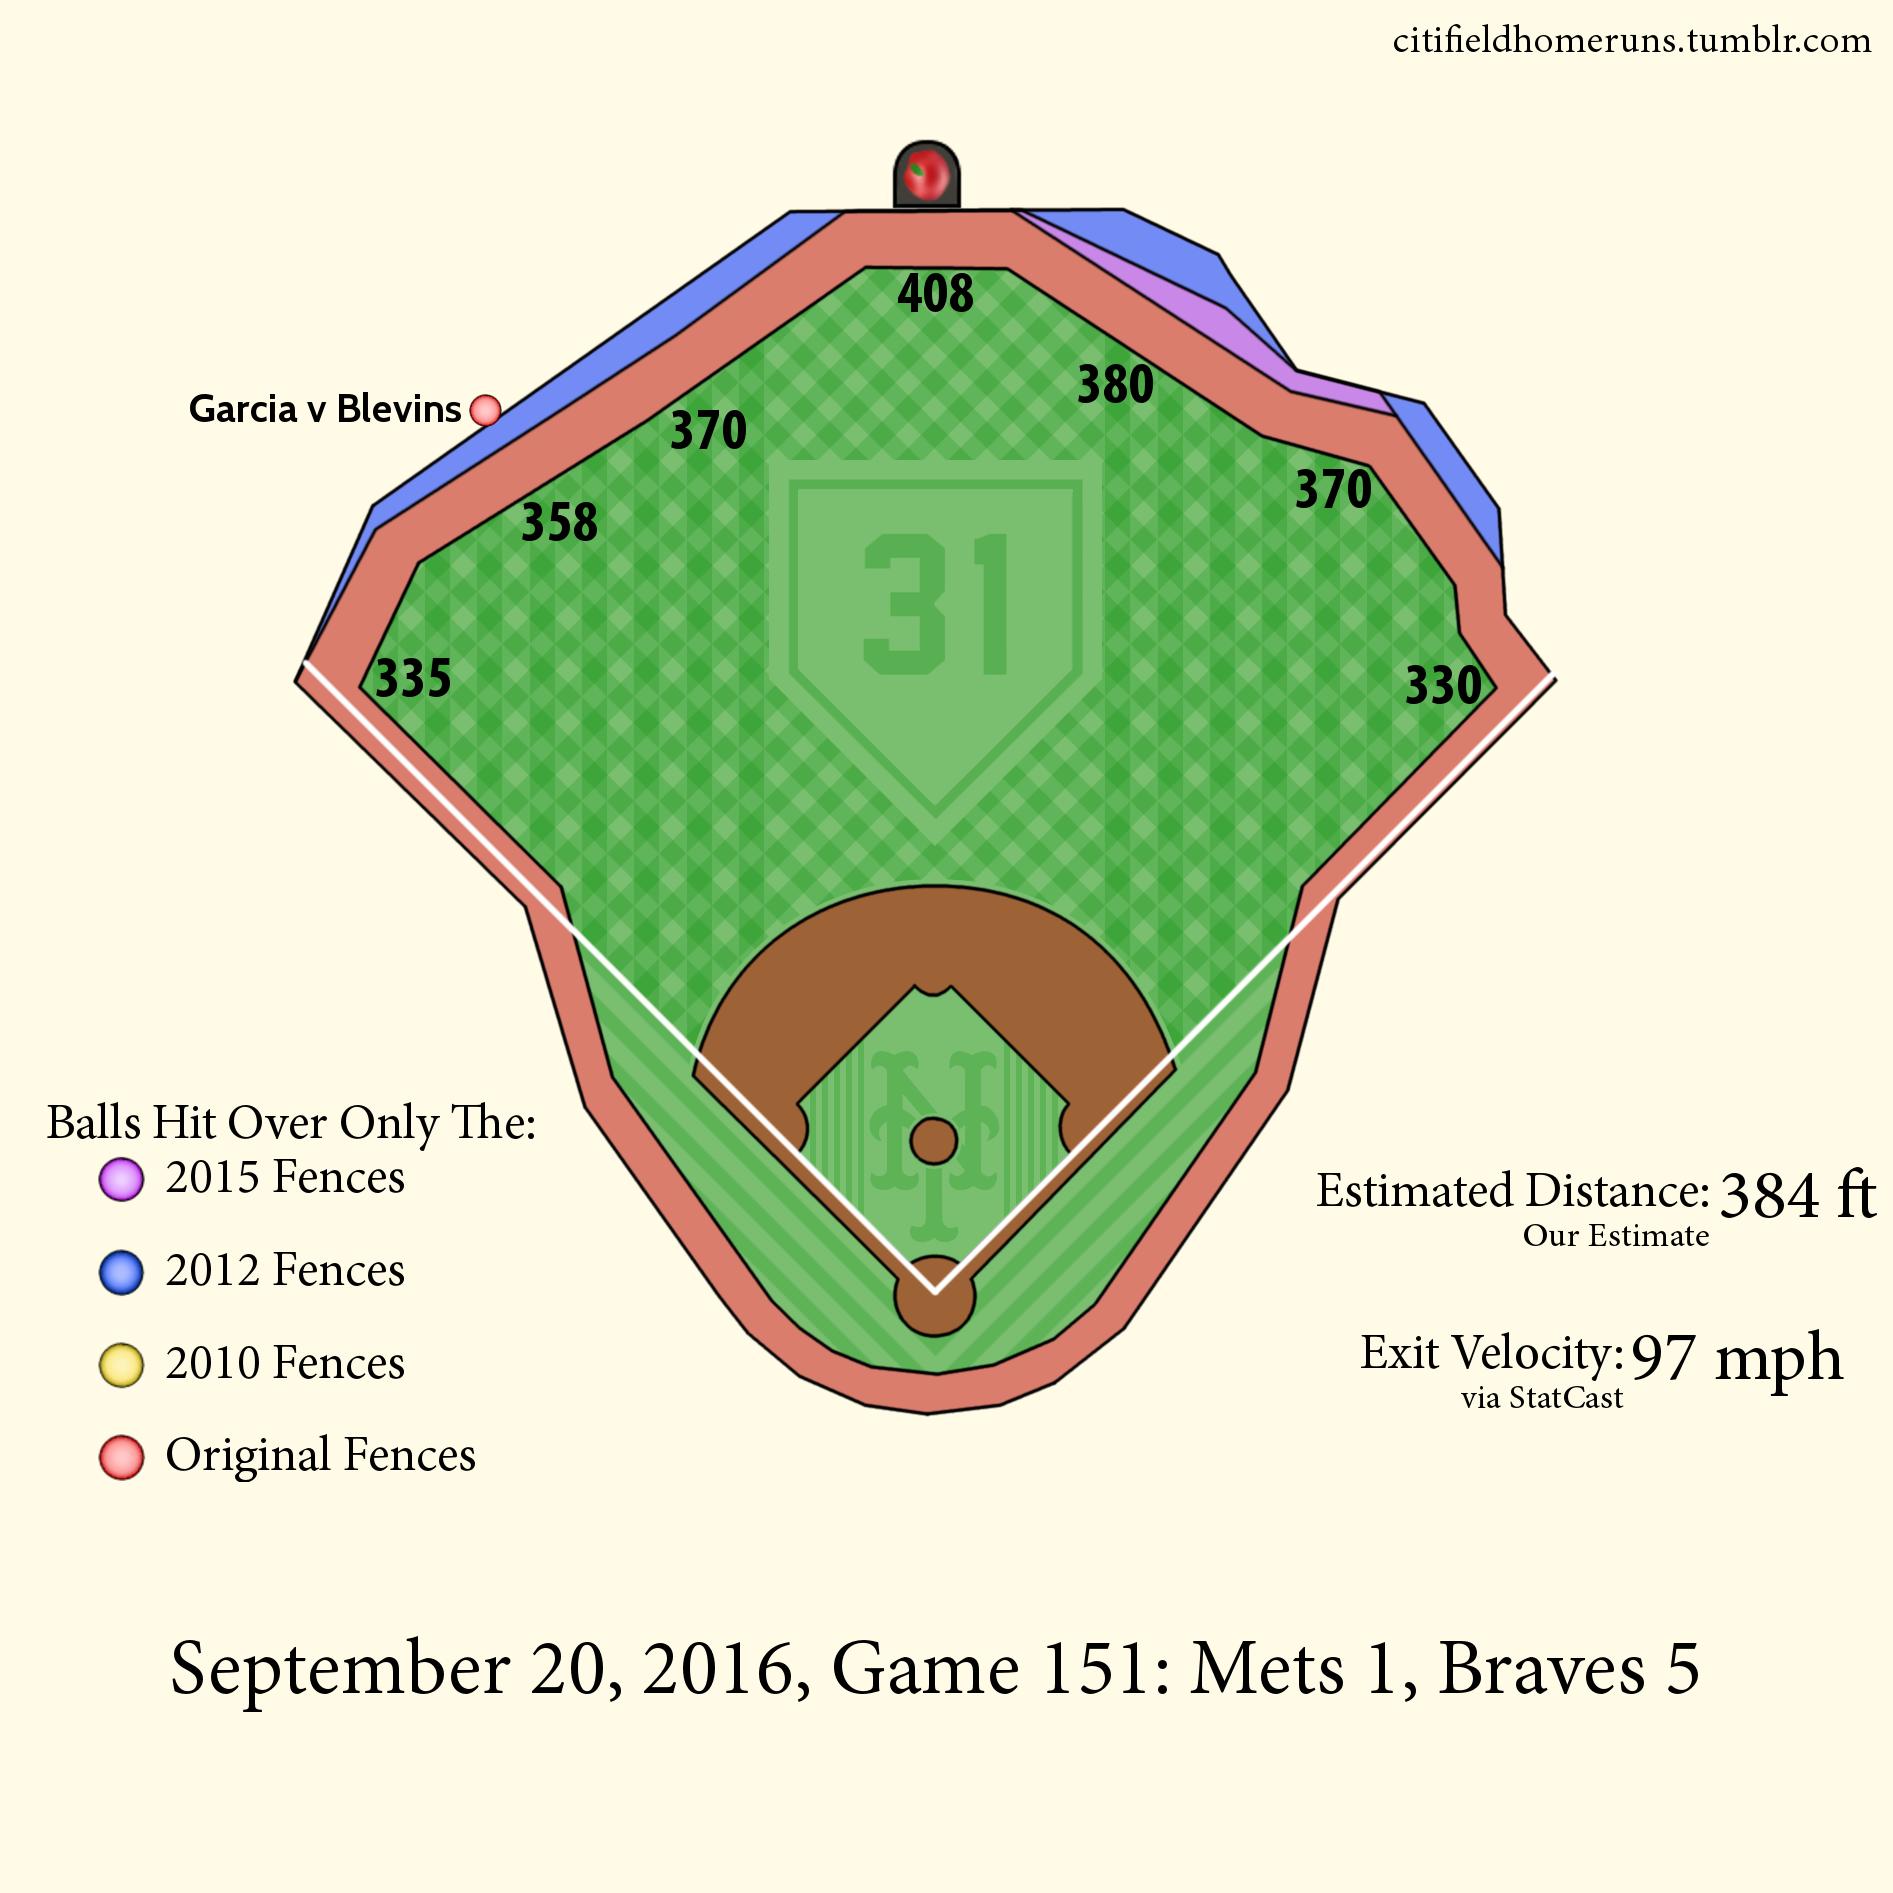 176. Garcia v Blevins: 1 Out, 0-1 Curveball, 3 Runs.